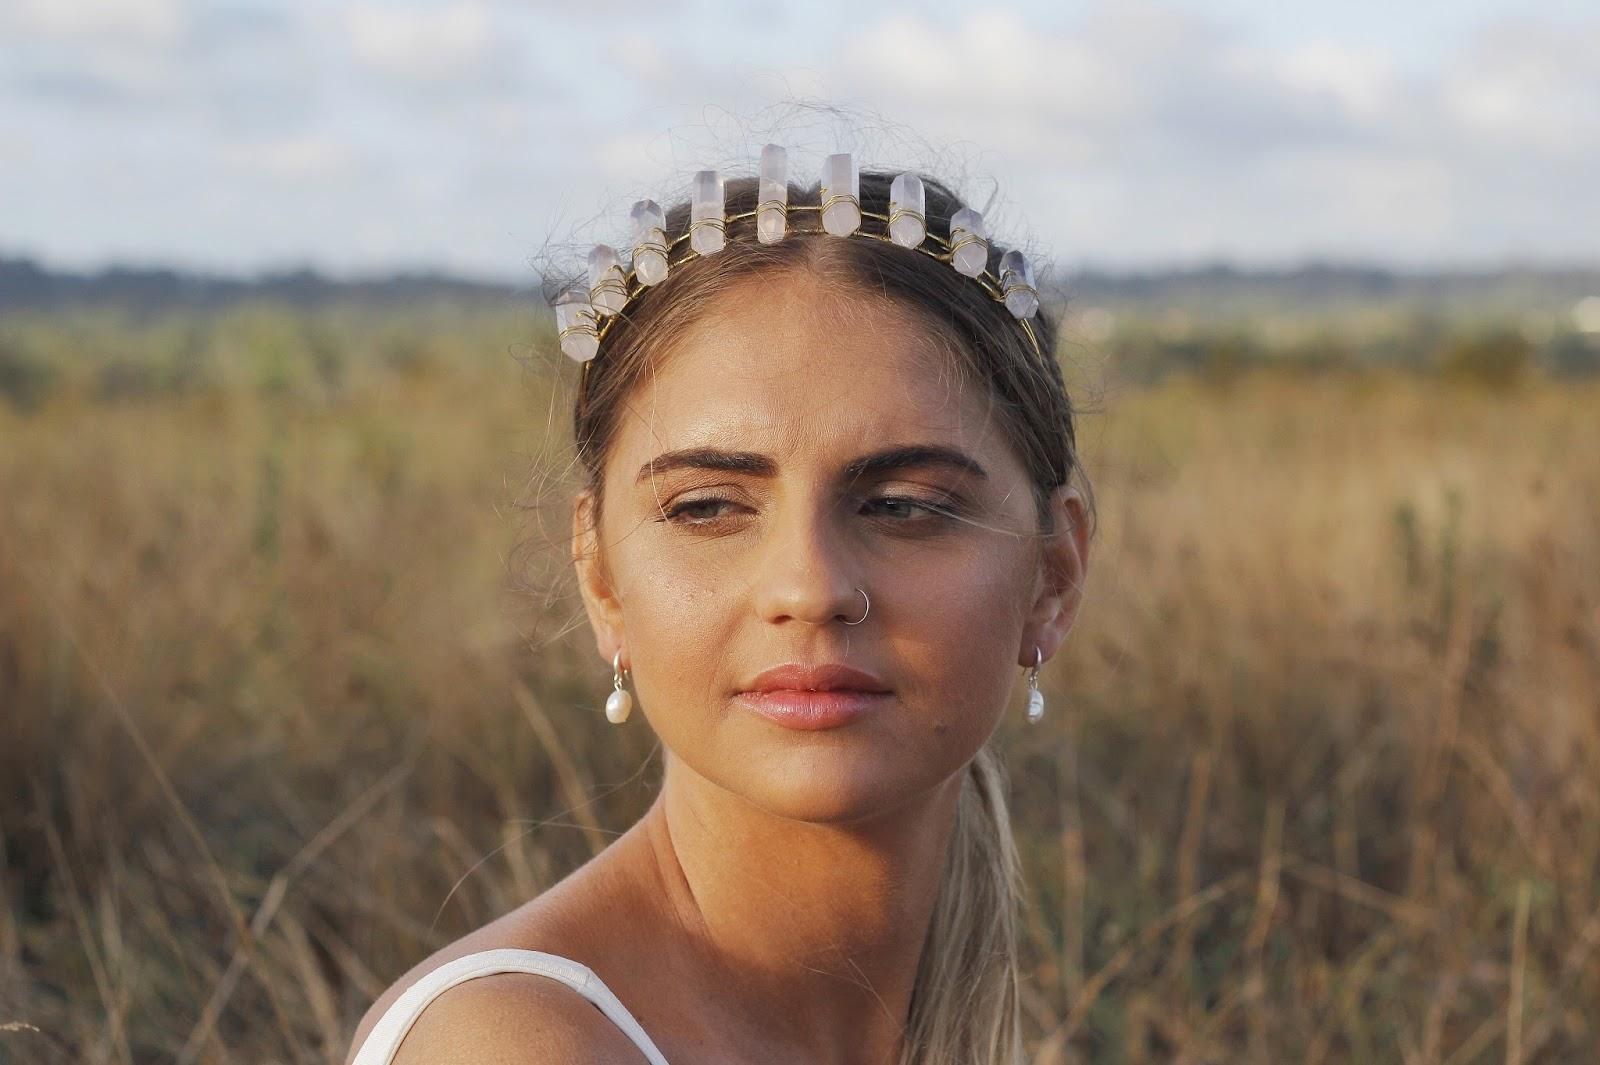 BRIDAL: LAVENDER & LILAC | BRIDAL HEADPIECE COLLECTION 2018